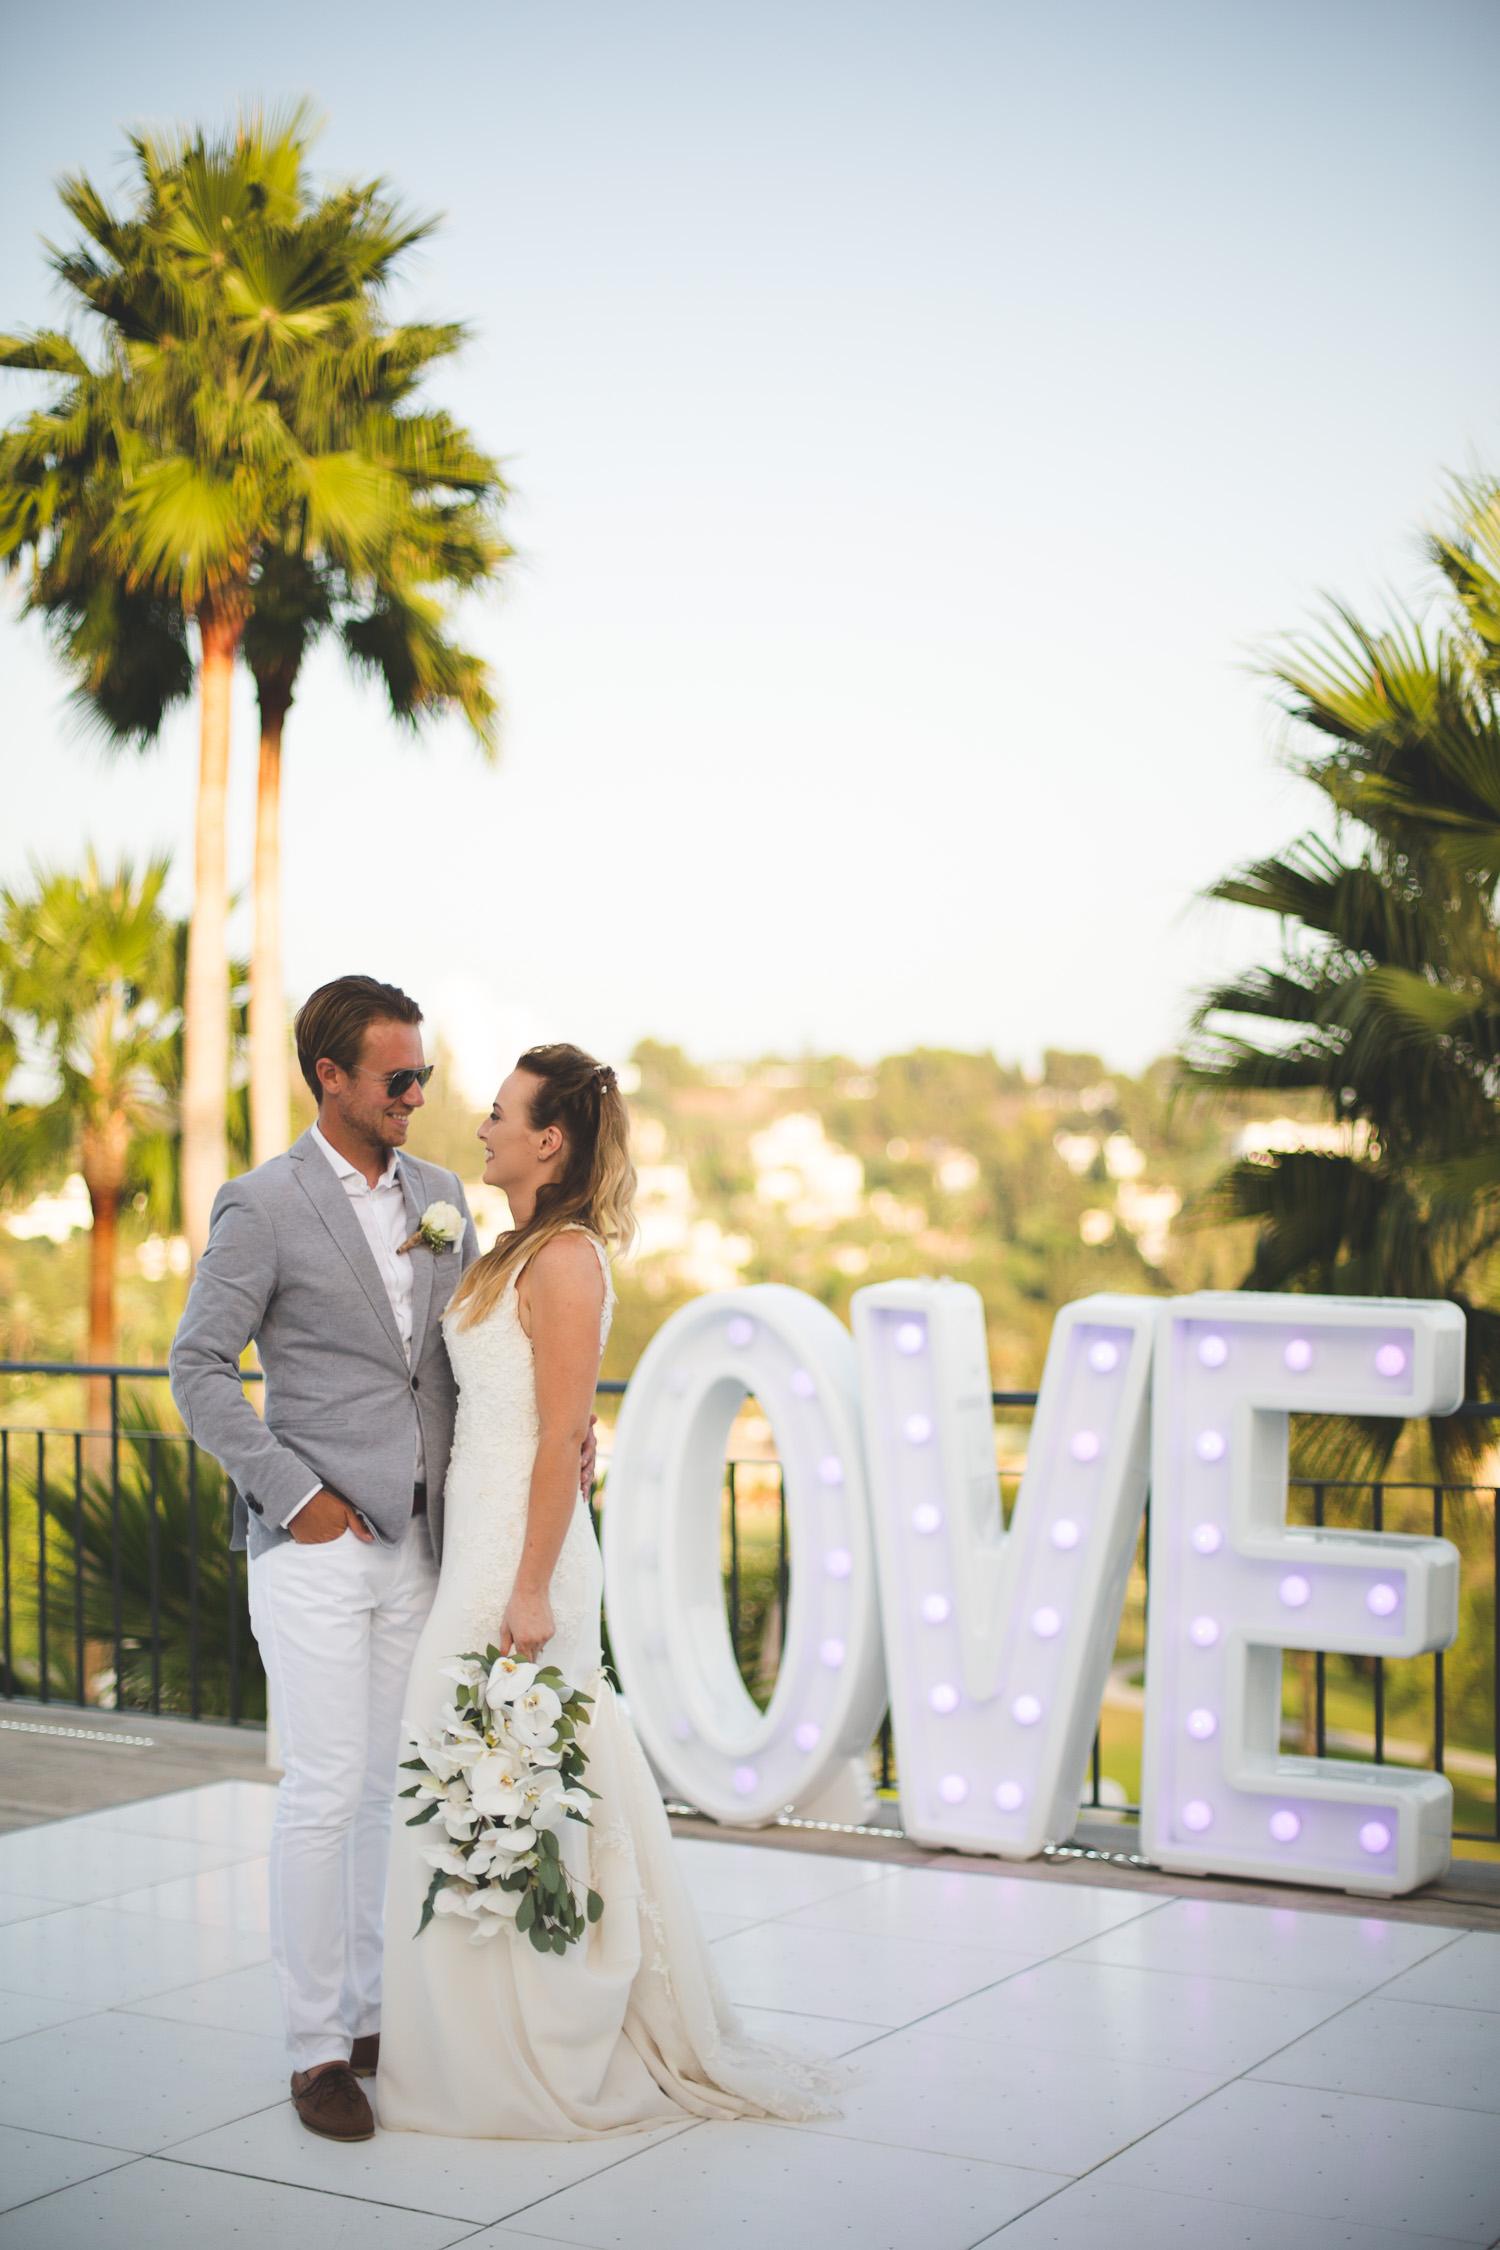 Surrey Wedding Photographer Kit Myers Paige Craig Spain134.jpg